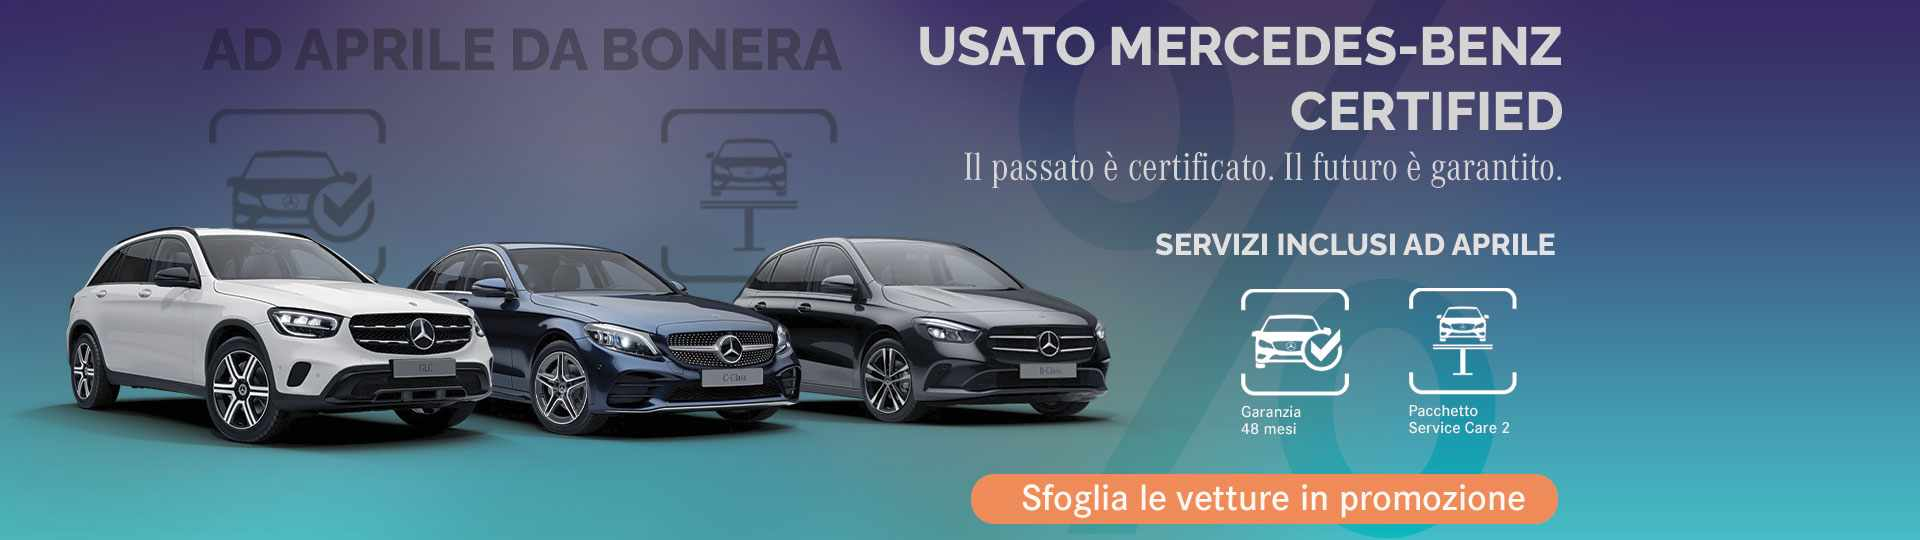 header_Usato_Certified_Aprile_2021.jpg